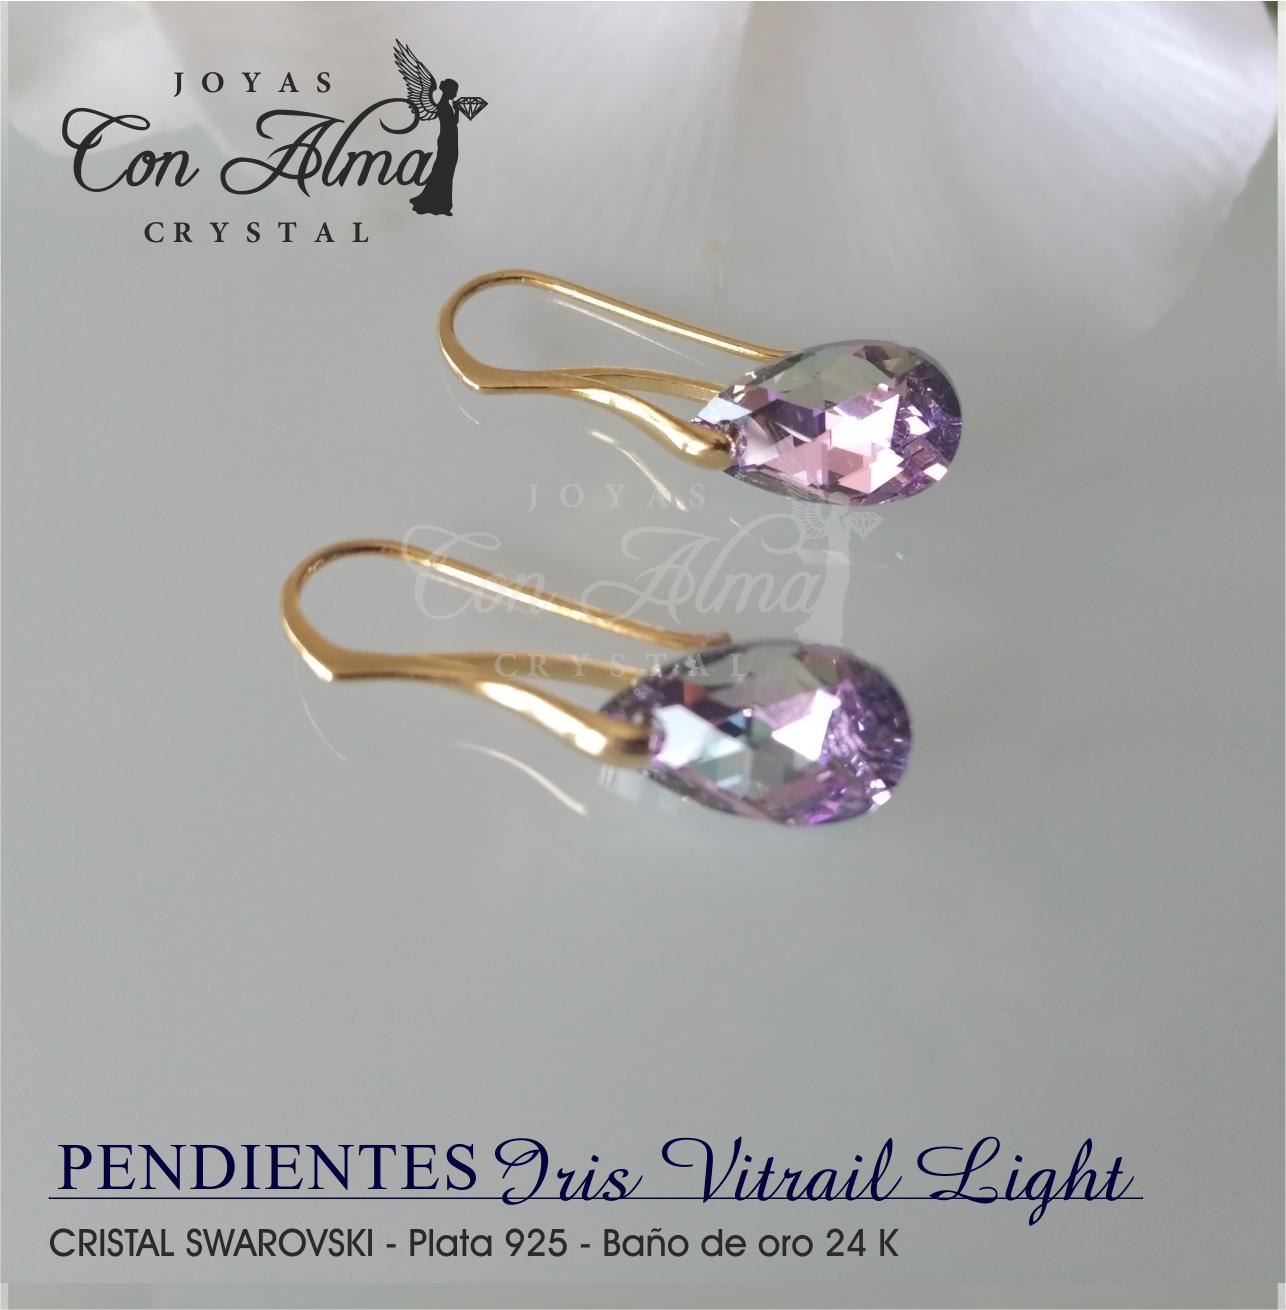 Pendientes Iris Vitrail Light  30 €